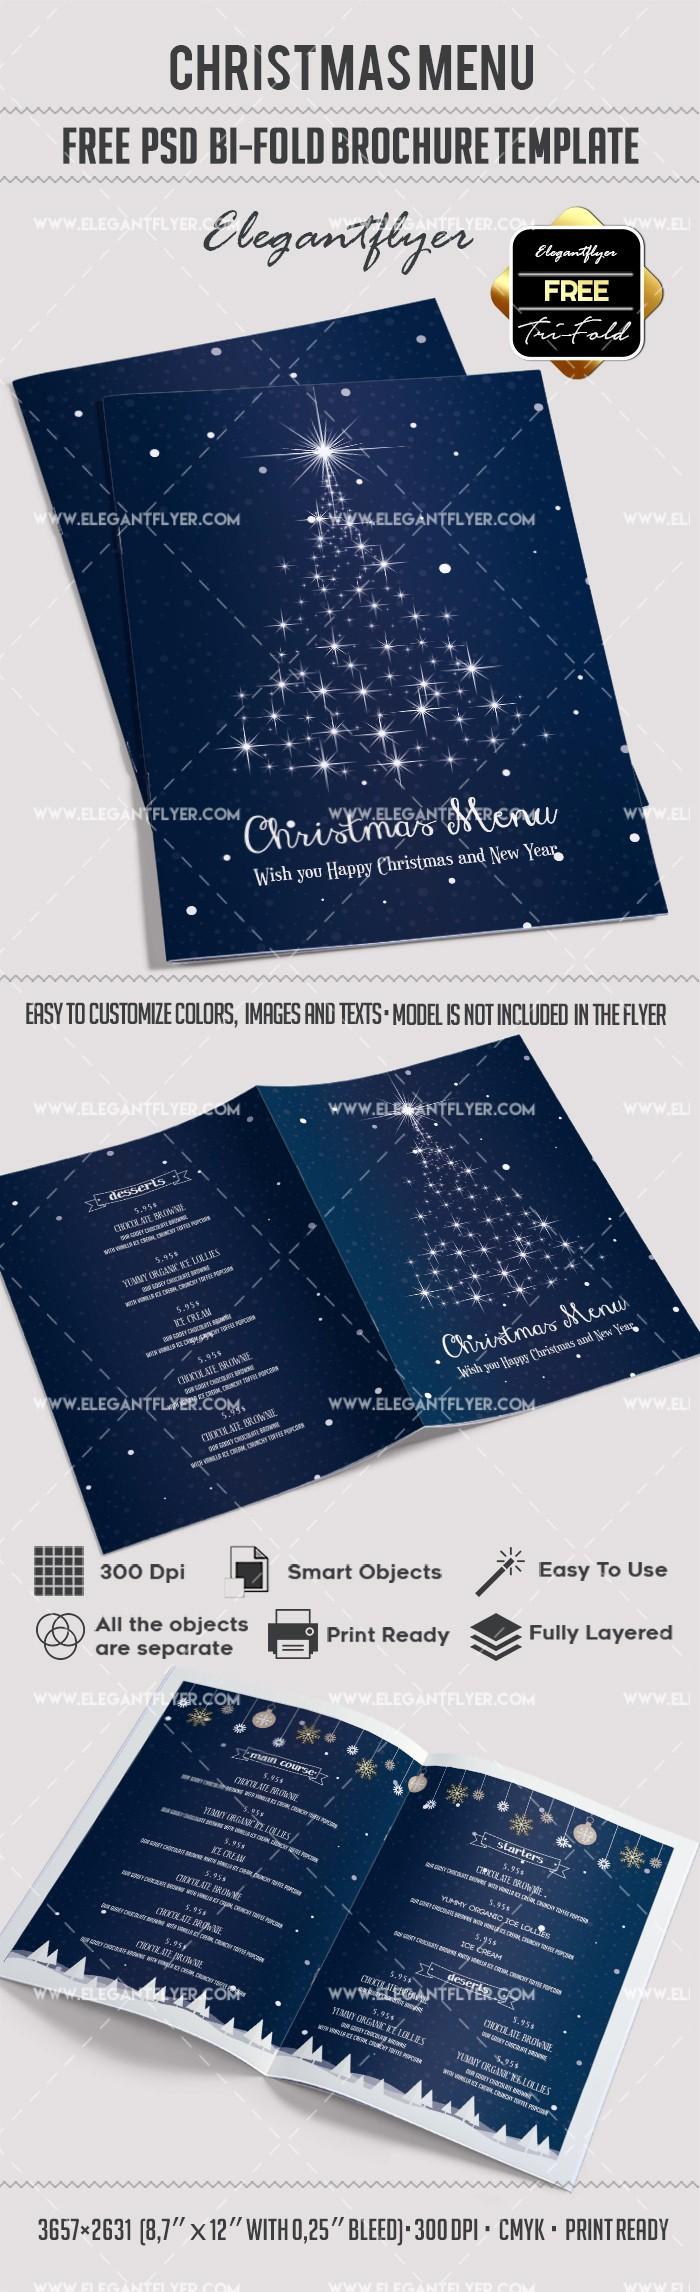 Bi-fold Brochure Template Fresh Free Christmas Menu – Bi Fold Psd Brochure Template – by